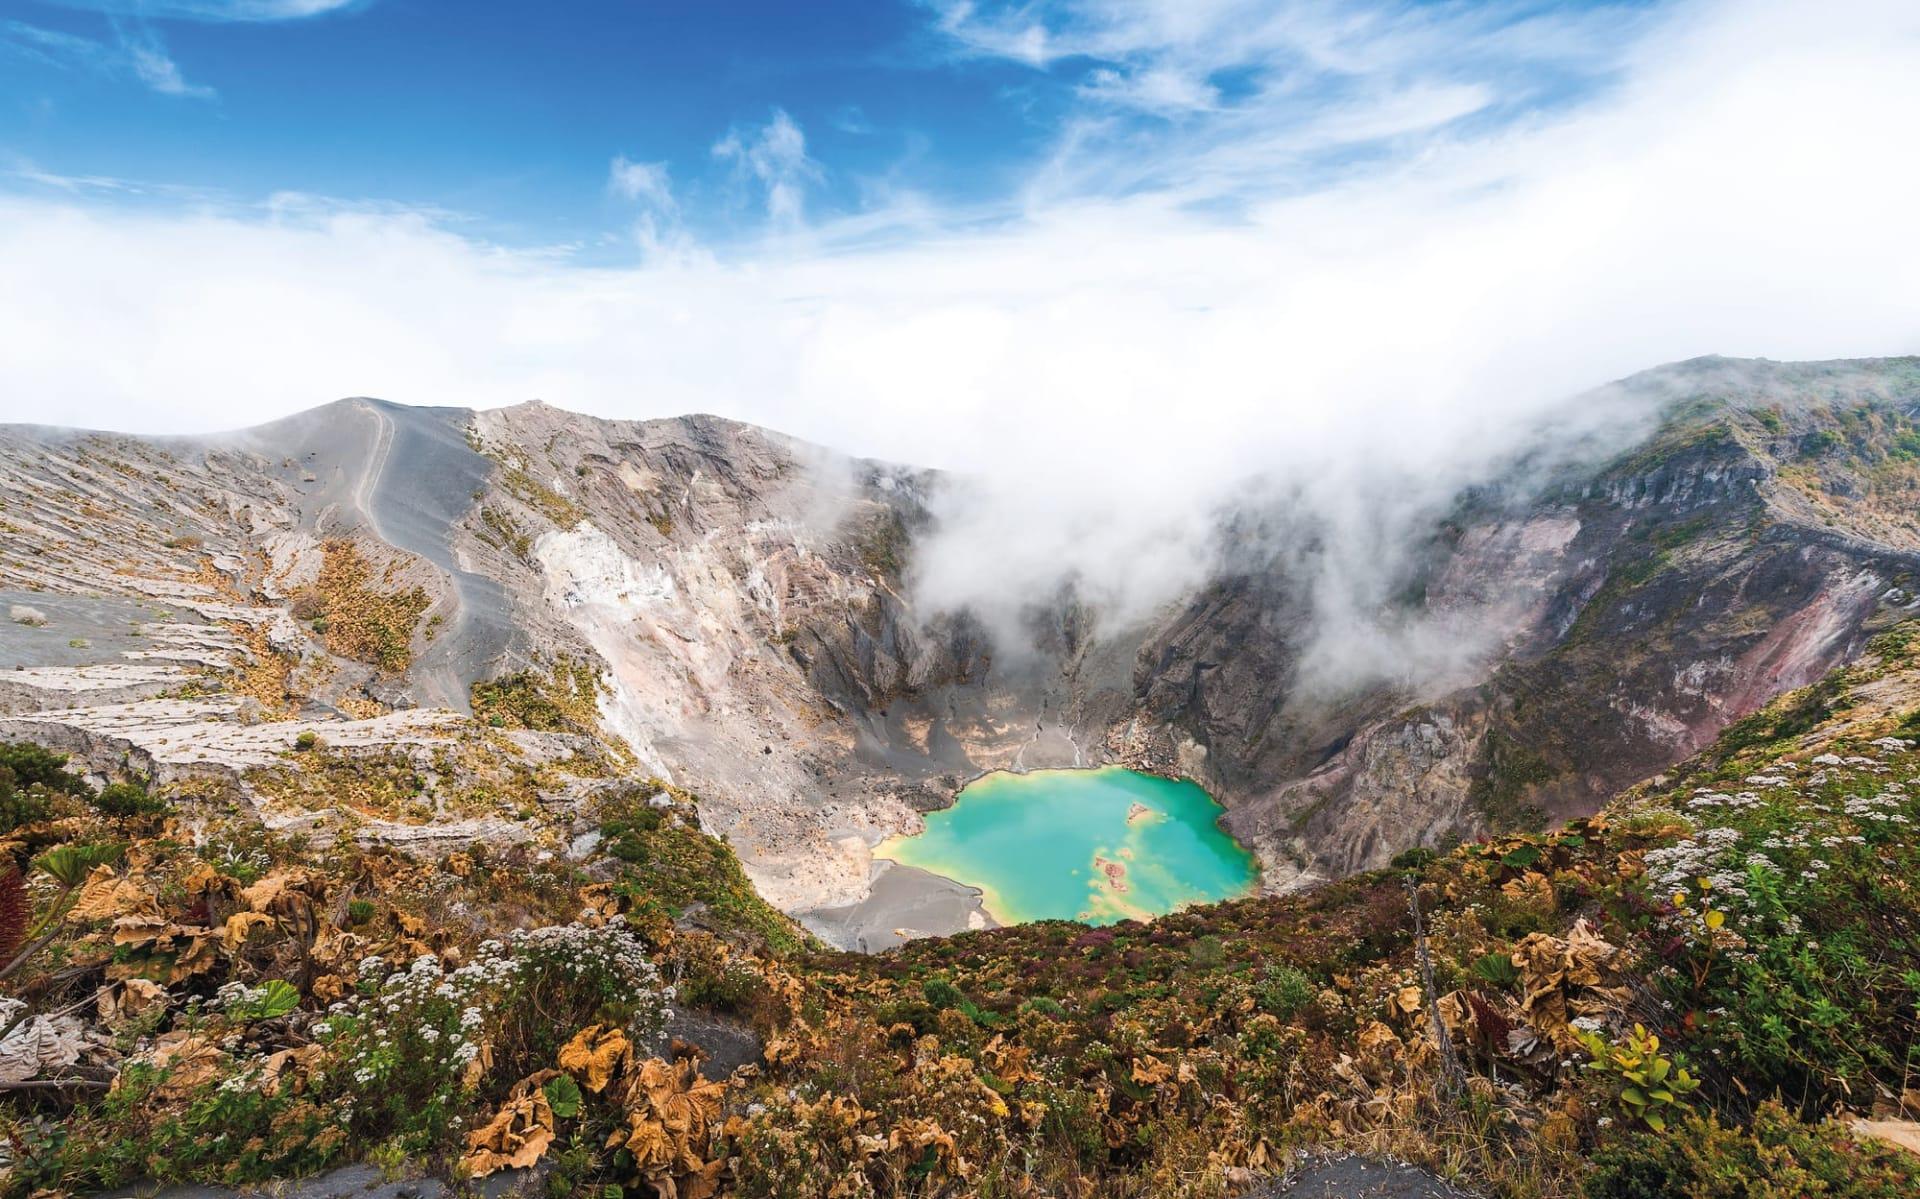 Wanderreise Costa Rica ab San José City: Costa Rica - Irazú Vulkan - Blick auf Krater